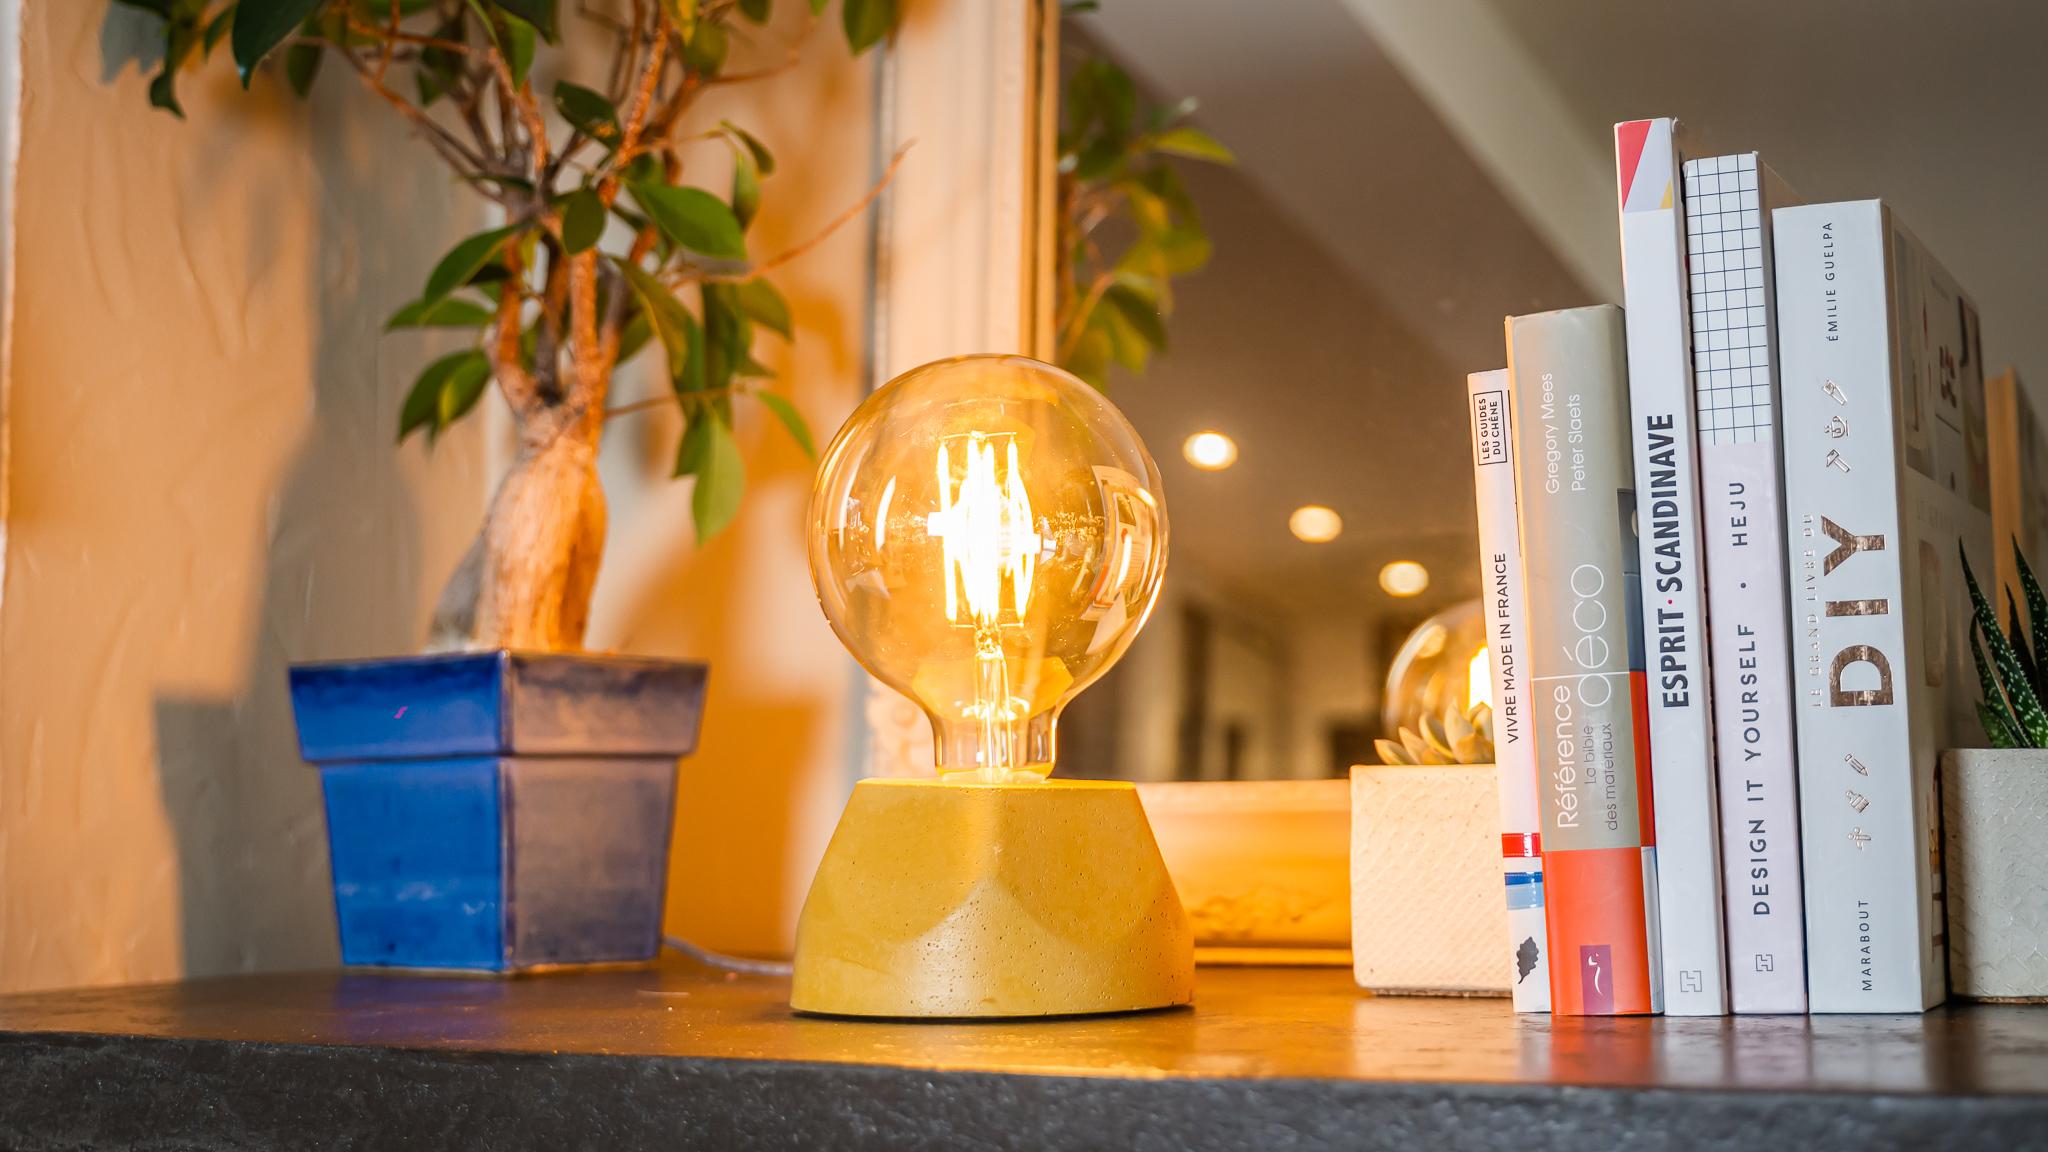 Lampe hexagone en béton jaune fabrication artisanale